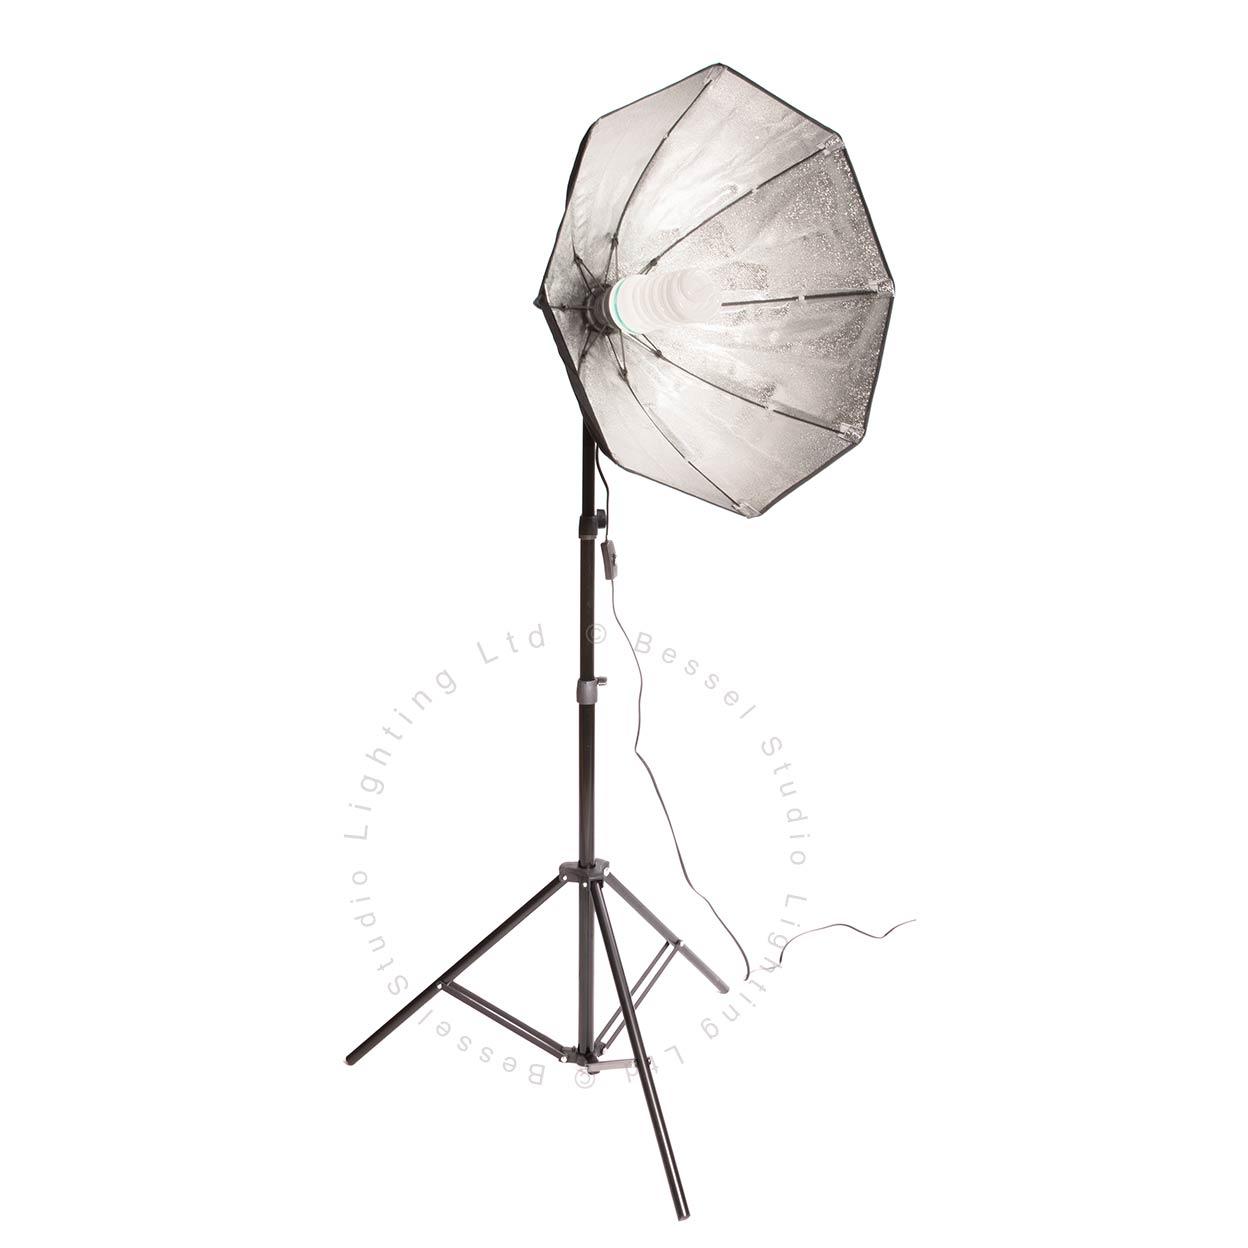 425W - 60cm Octabox Kit (1 x 85W low energy)